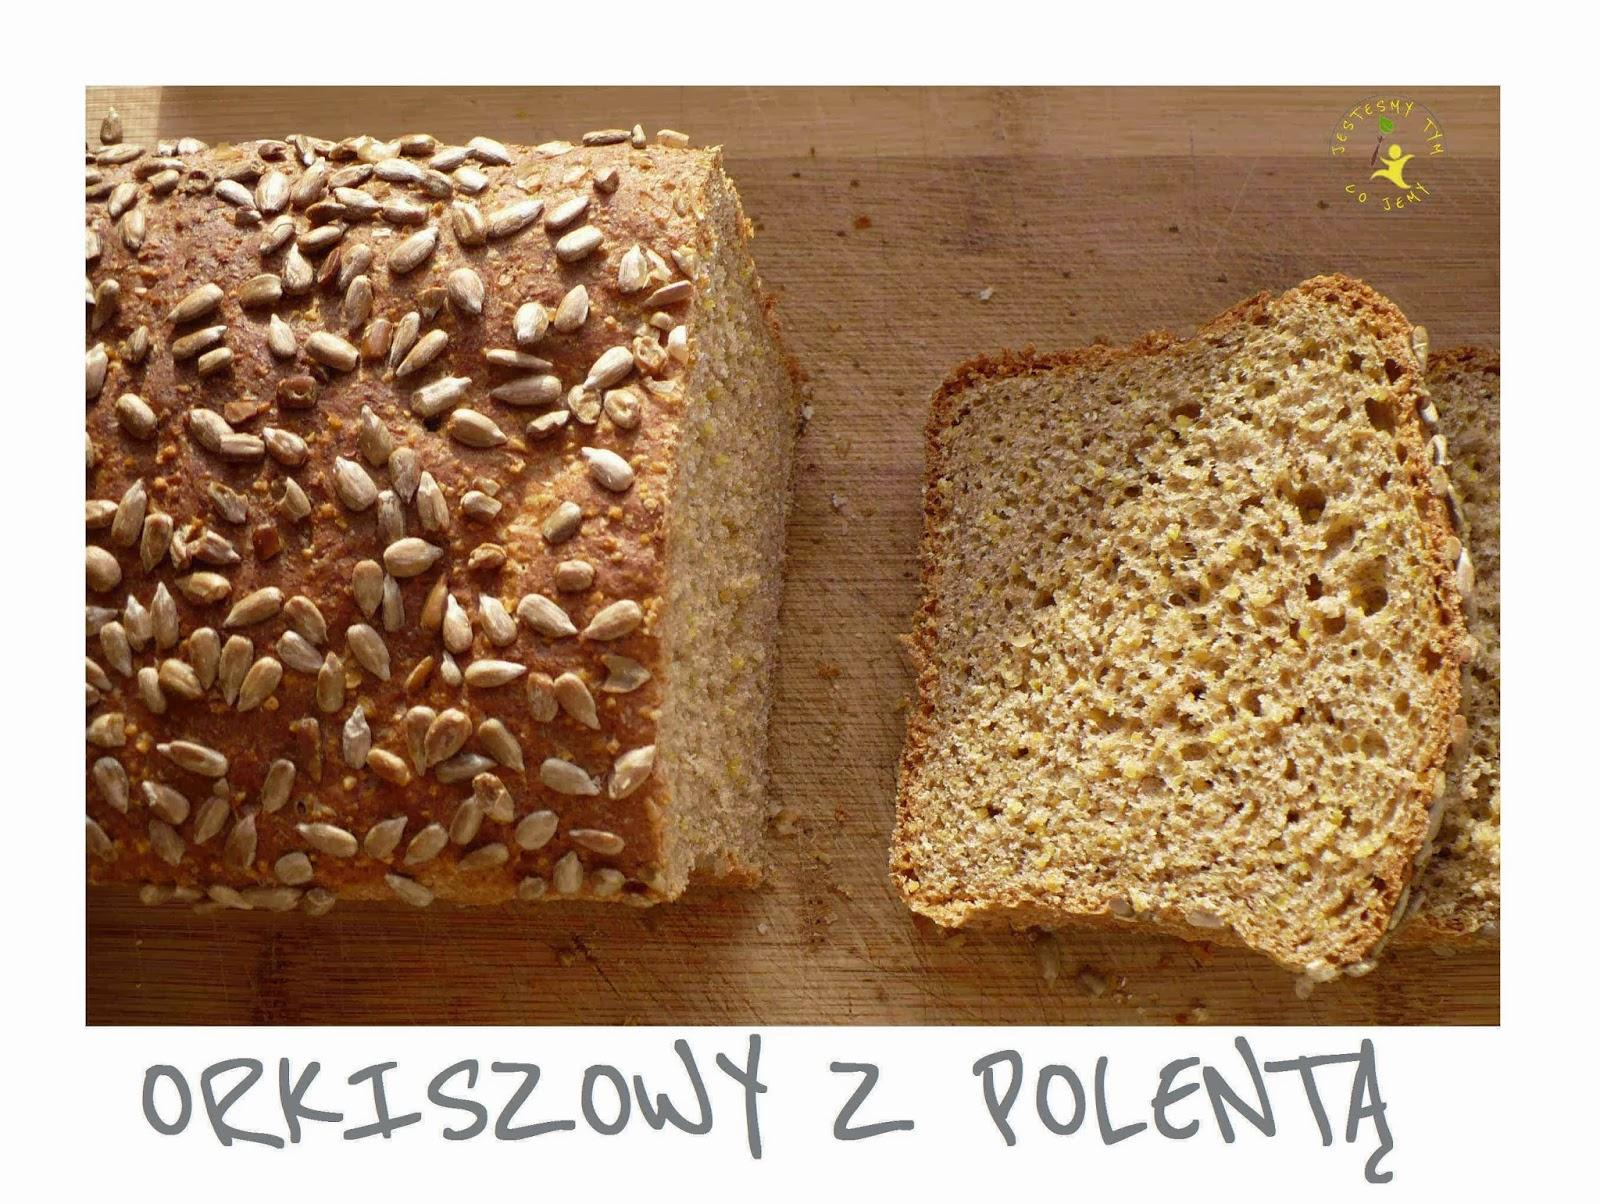 http://jestesmytymcojemy.blogspot.com/2014/01/chleb-orkiszowy-z-polenta.html